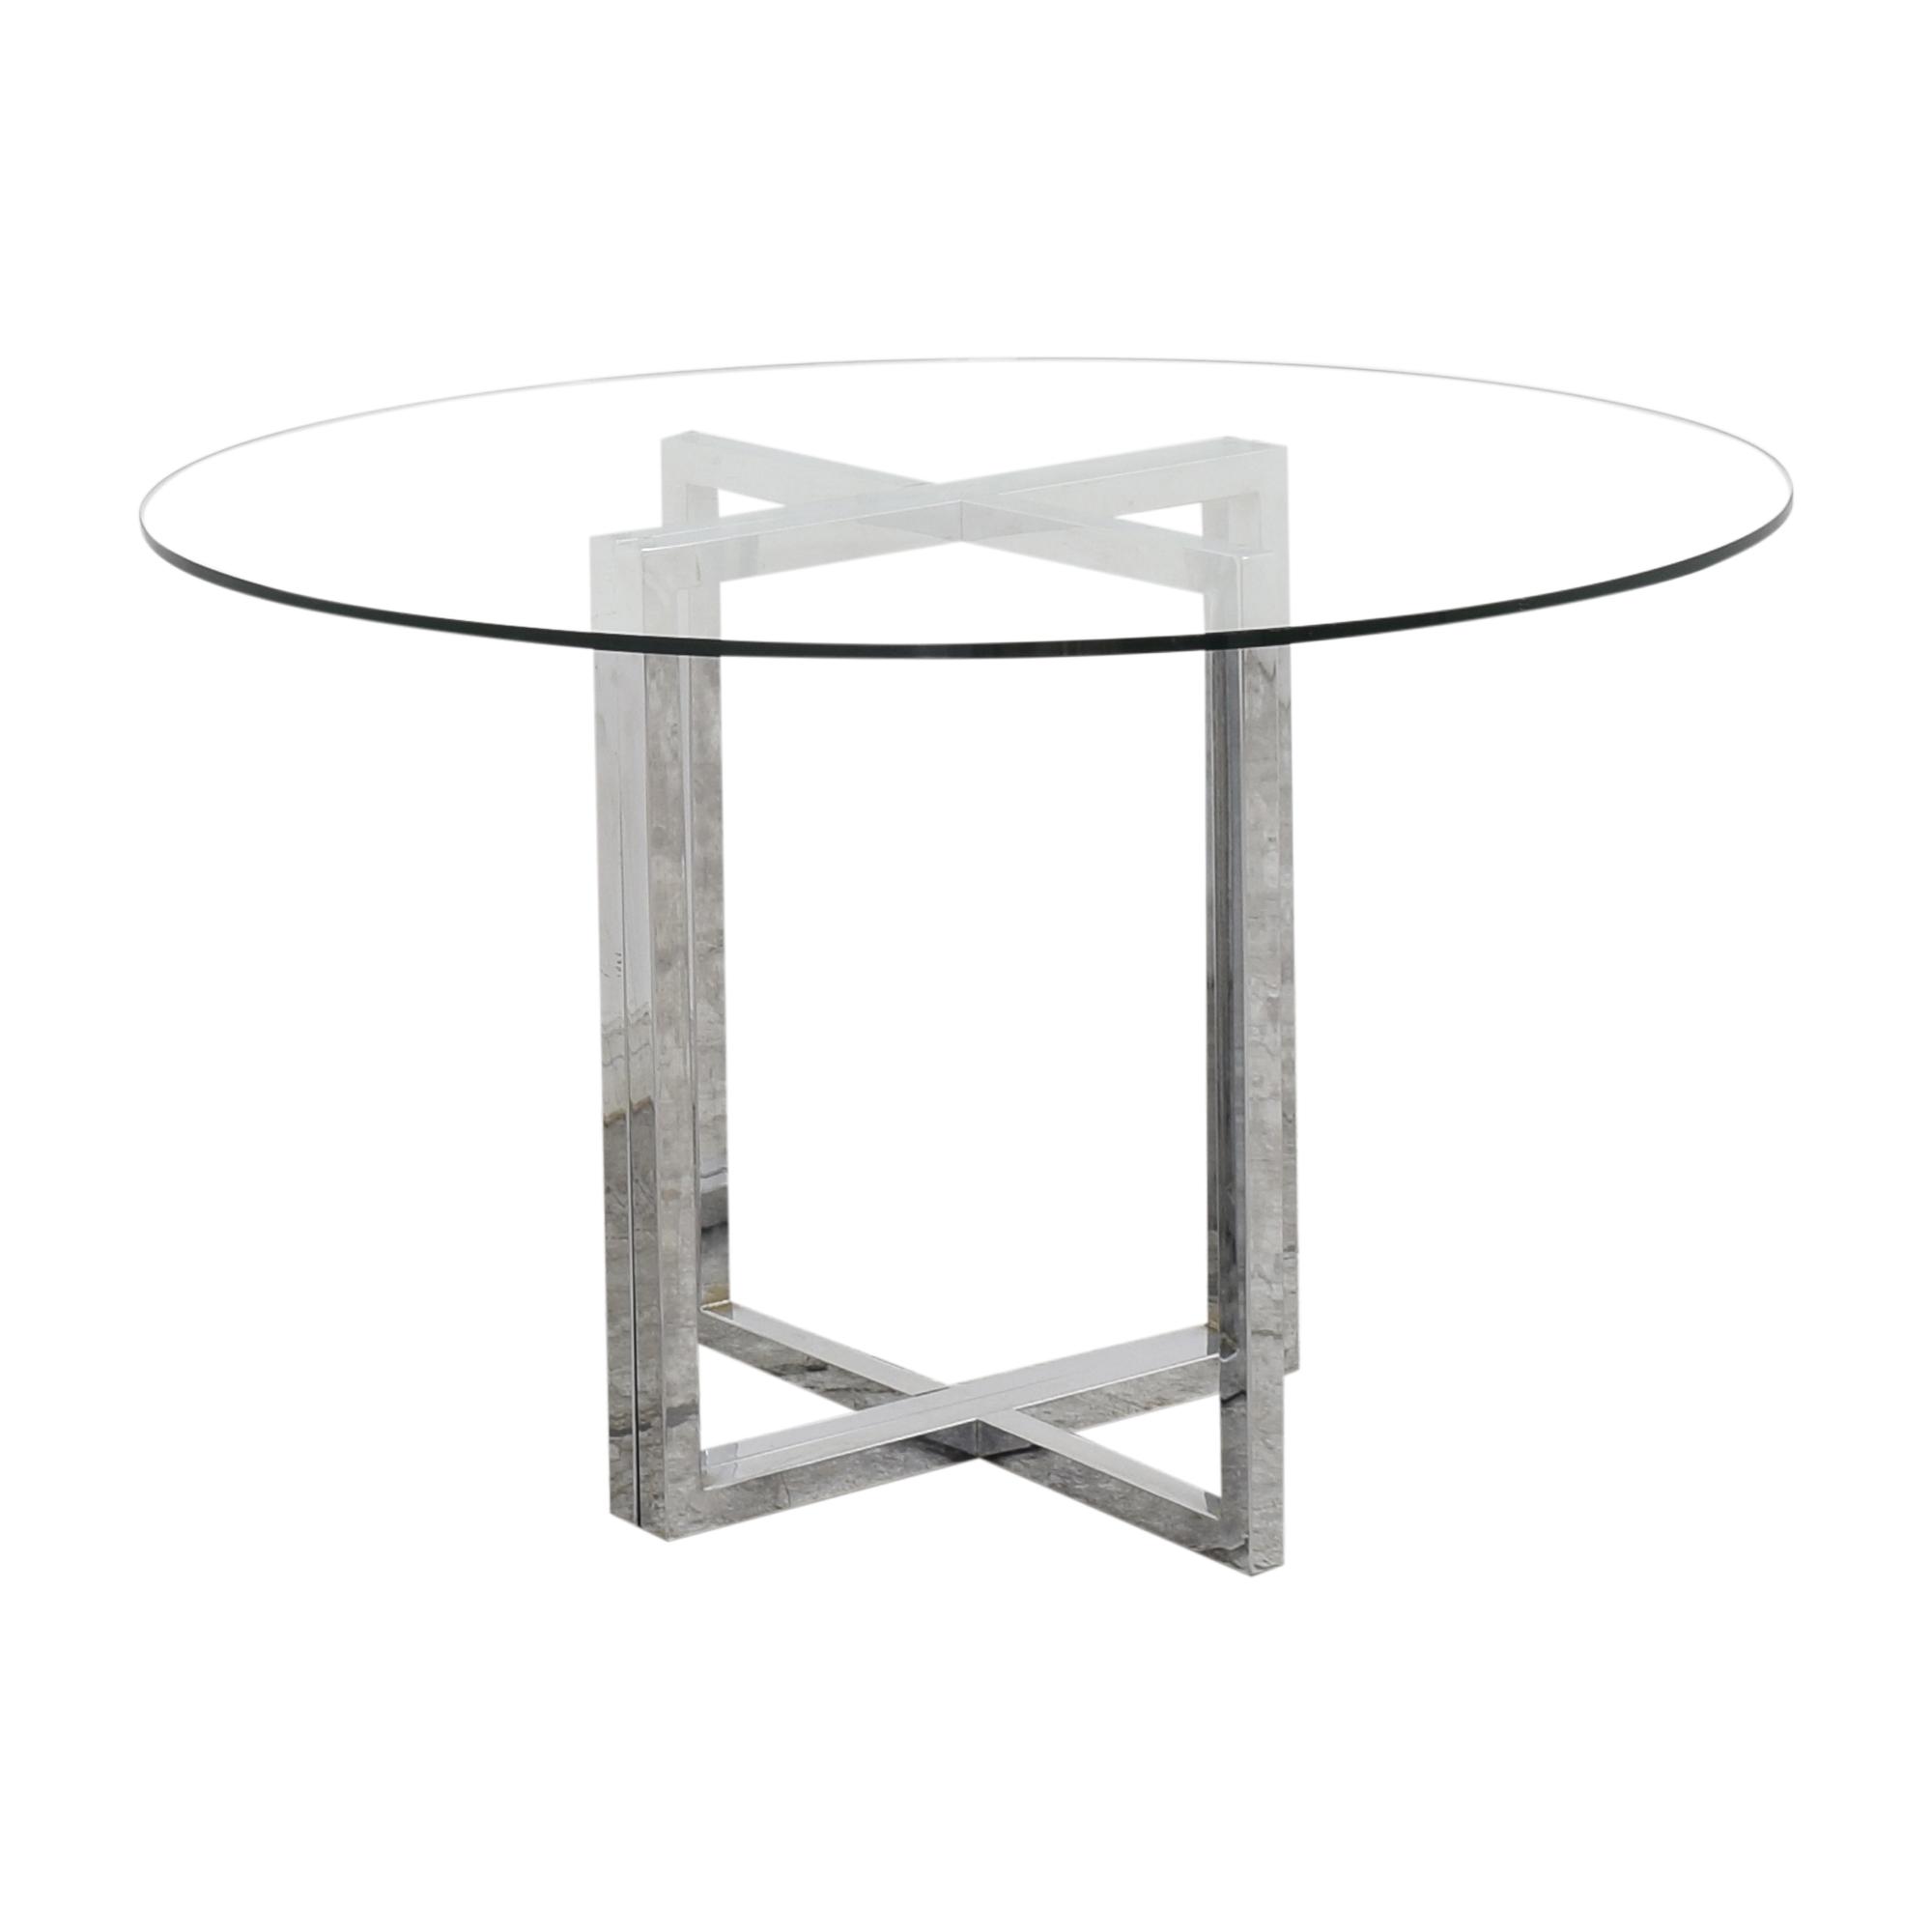 CB2 CB2 Silverado Table Tables